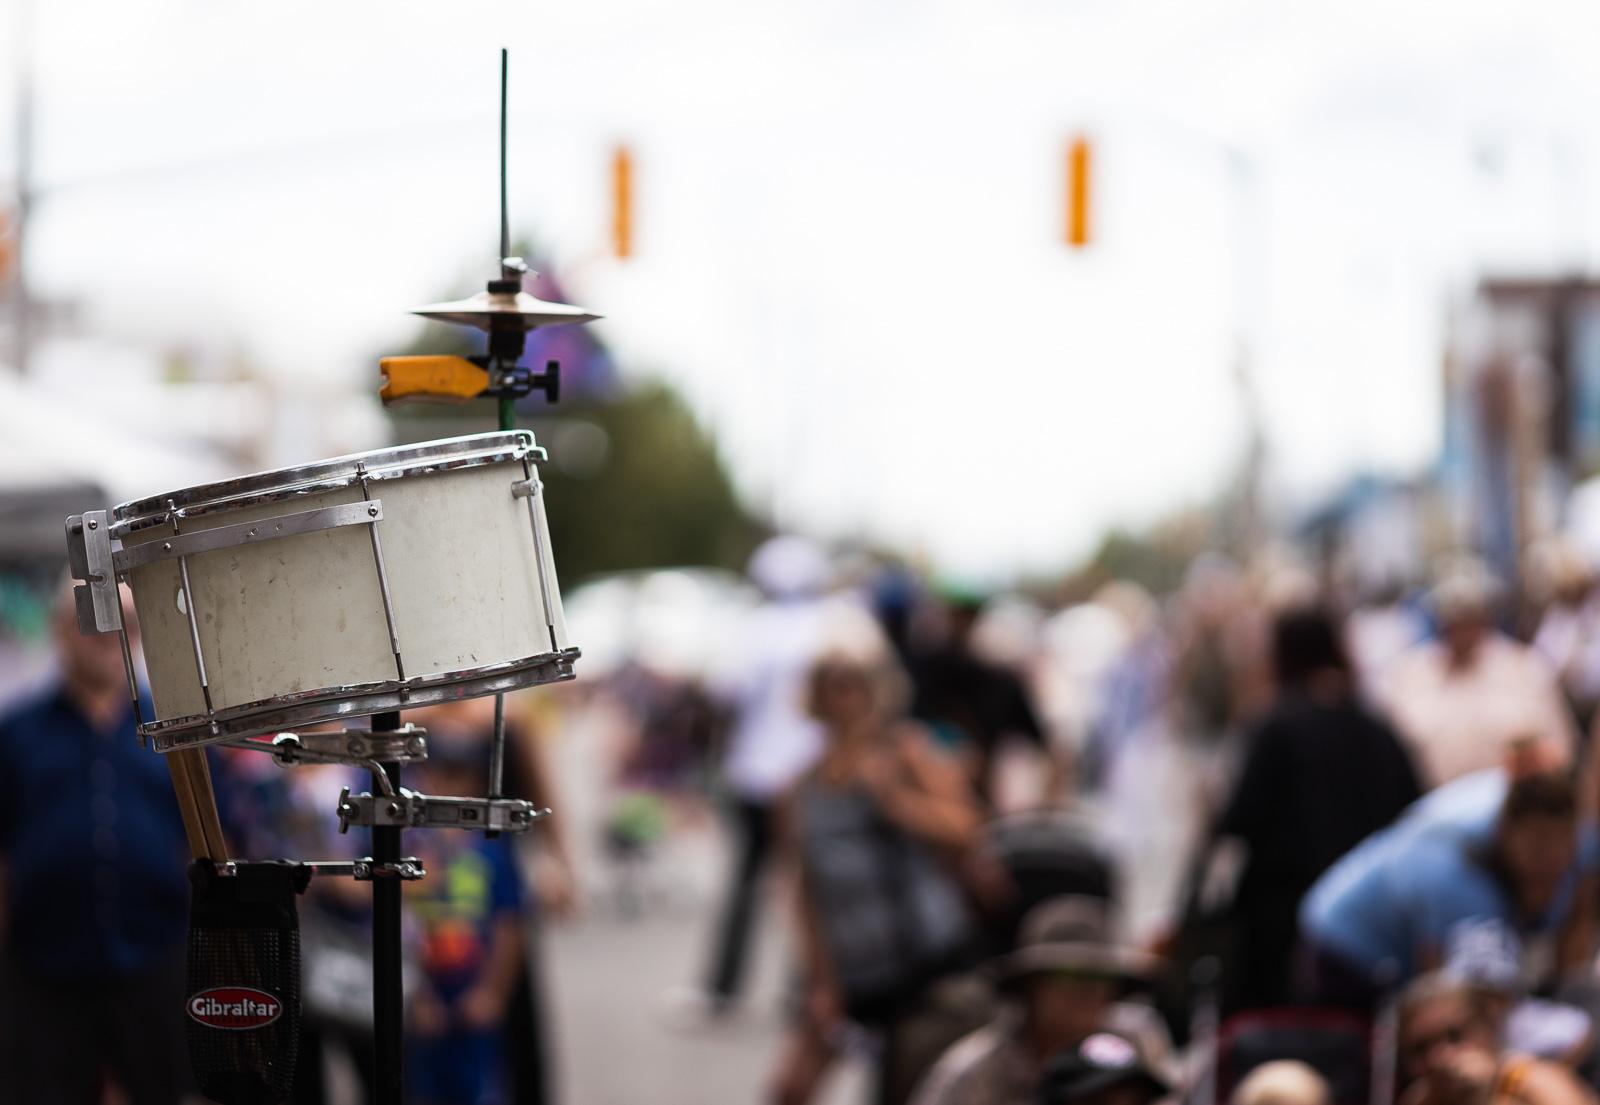 7th-annual-buskers-festival-blog-13.jpg